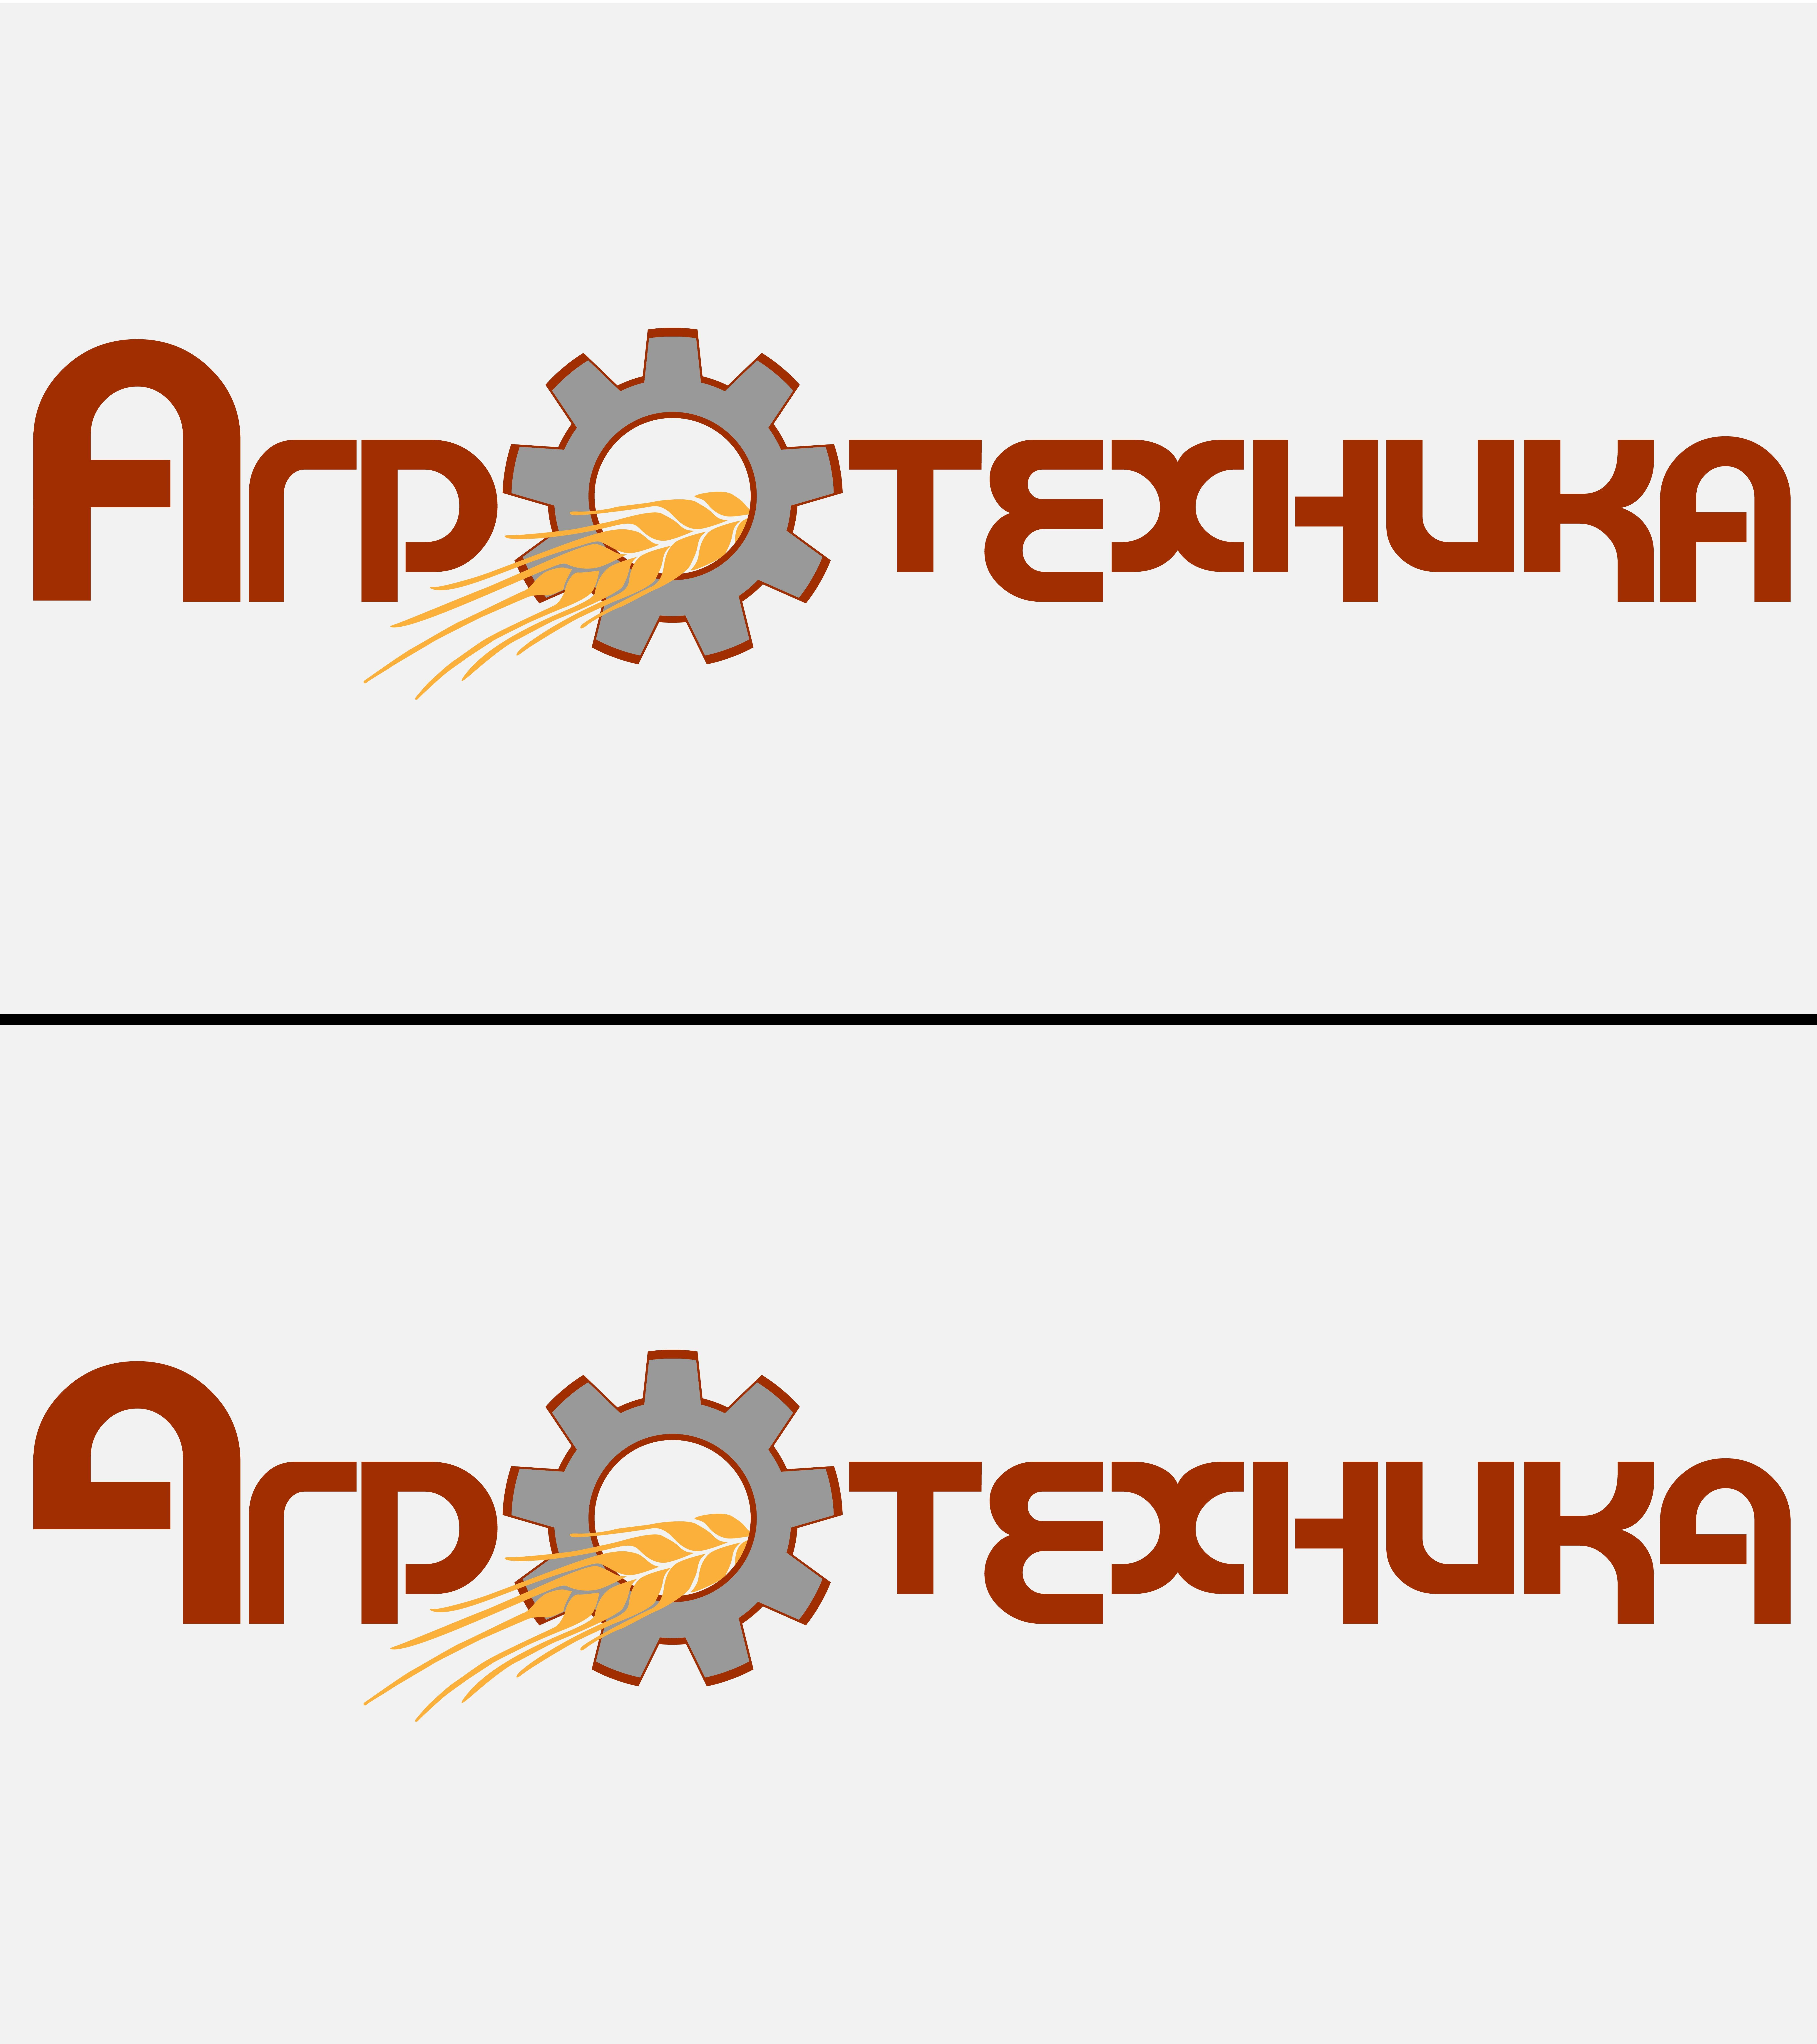 Разработка логотипа для компании Агротехника фото f_6725c02e1c6751d5.jpg